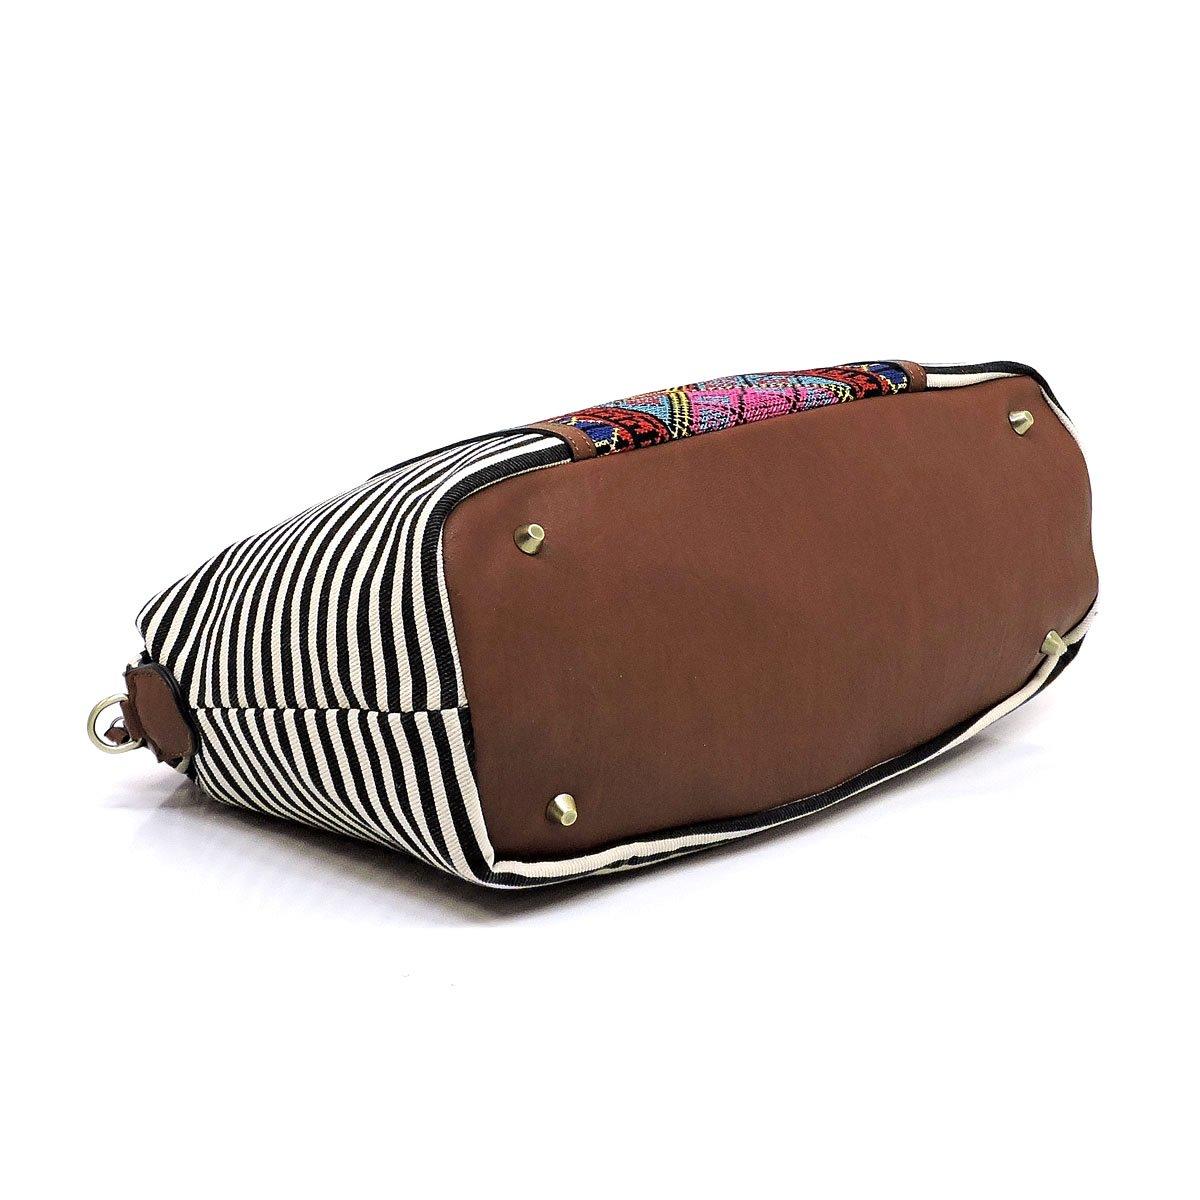 Boho striped canvas satchel bags tote handbags and shoulder purses